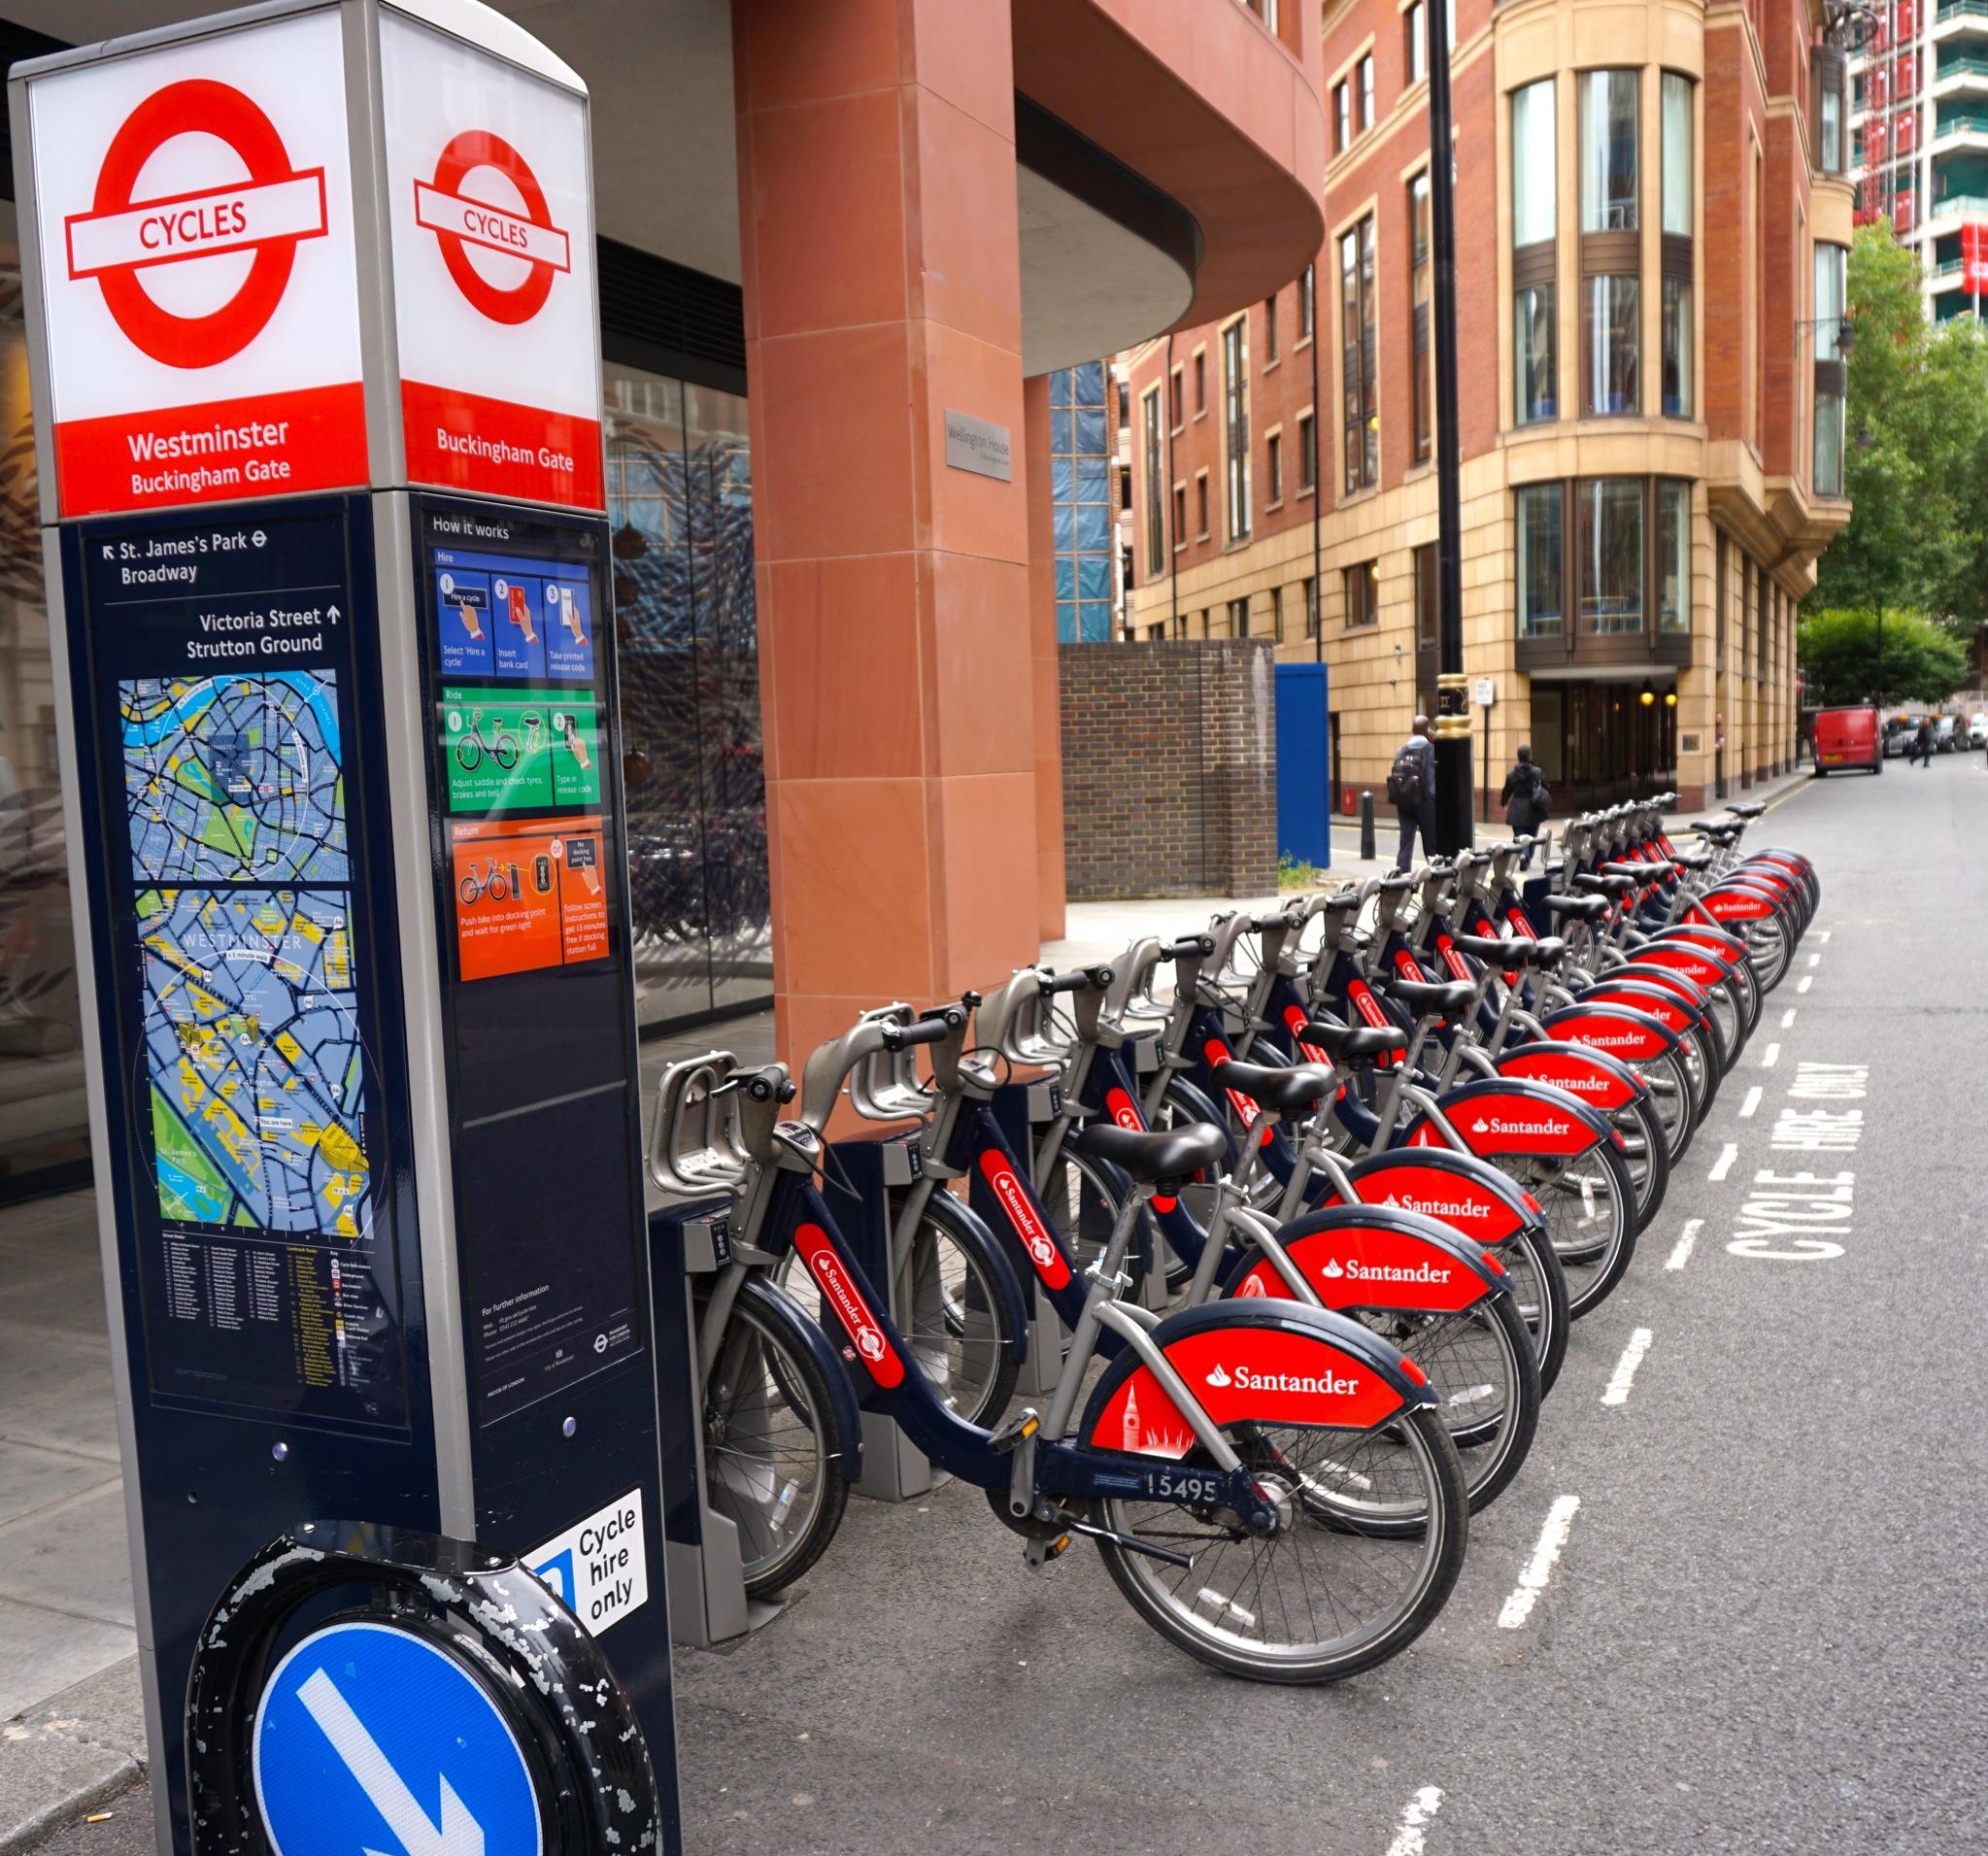 Dockingstation der Santander Fahrräder.